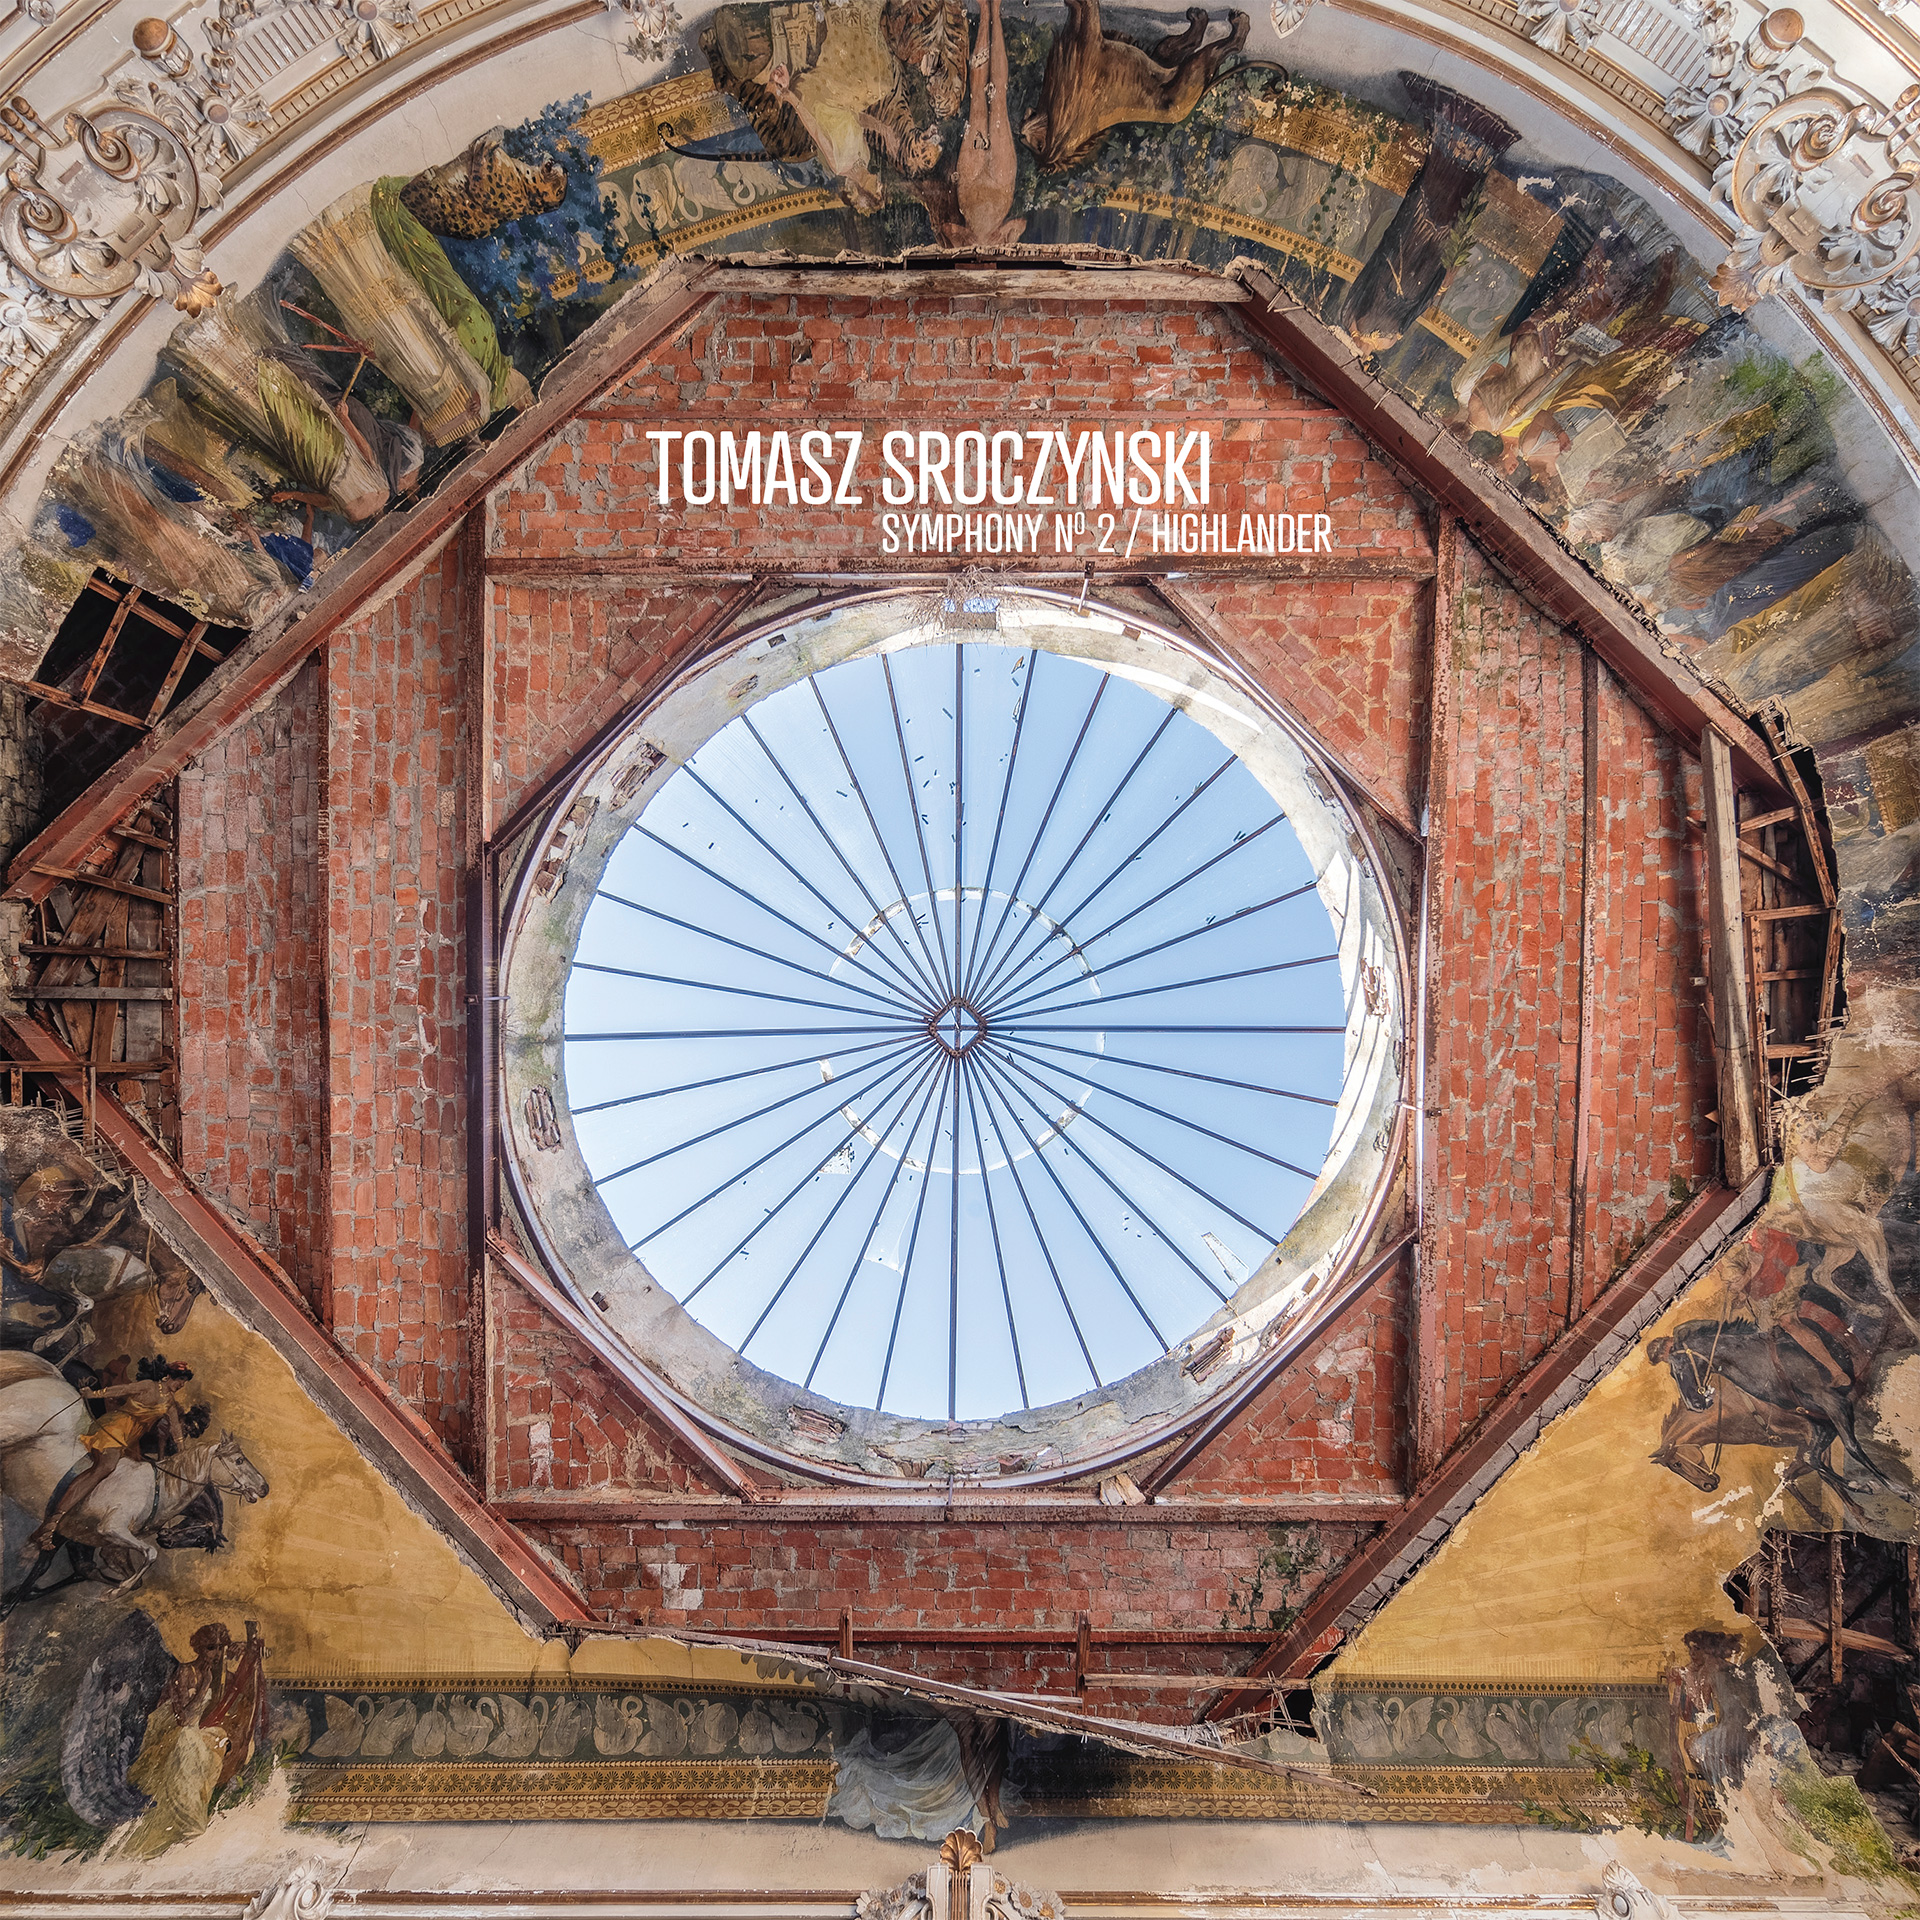 Tomasz Sroczynski – Symphony n°2 / Highlander